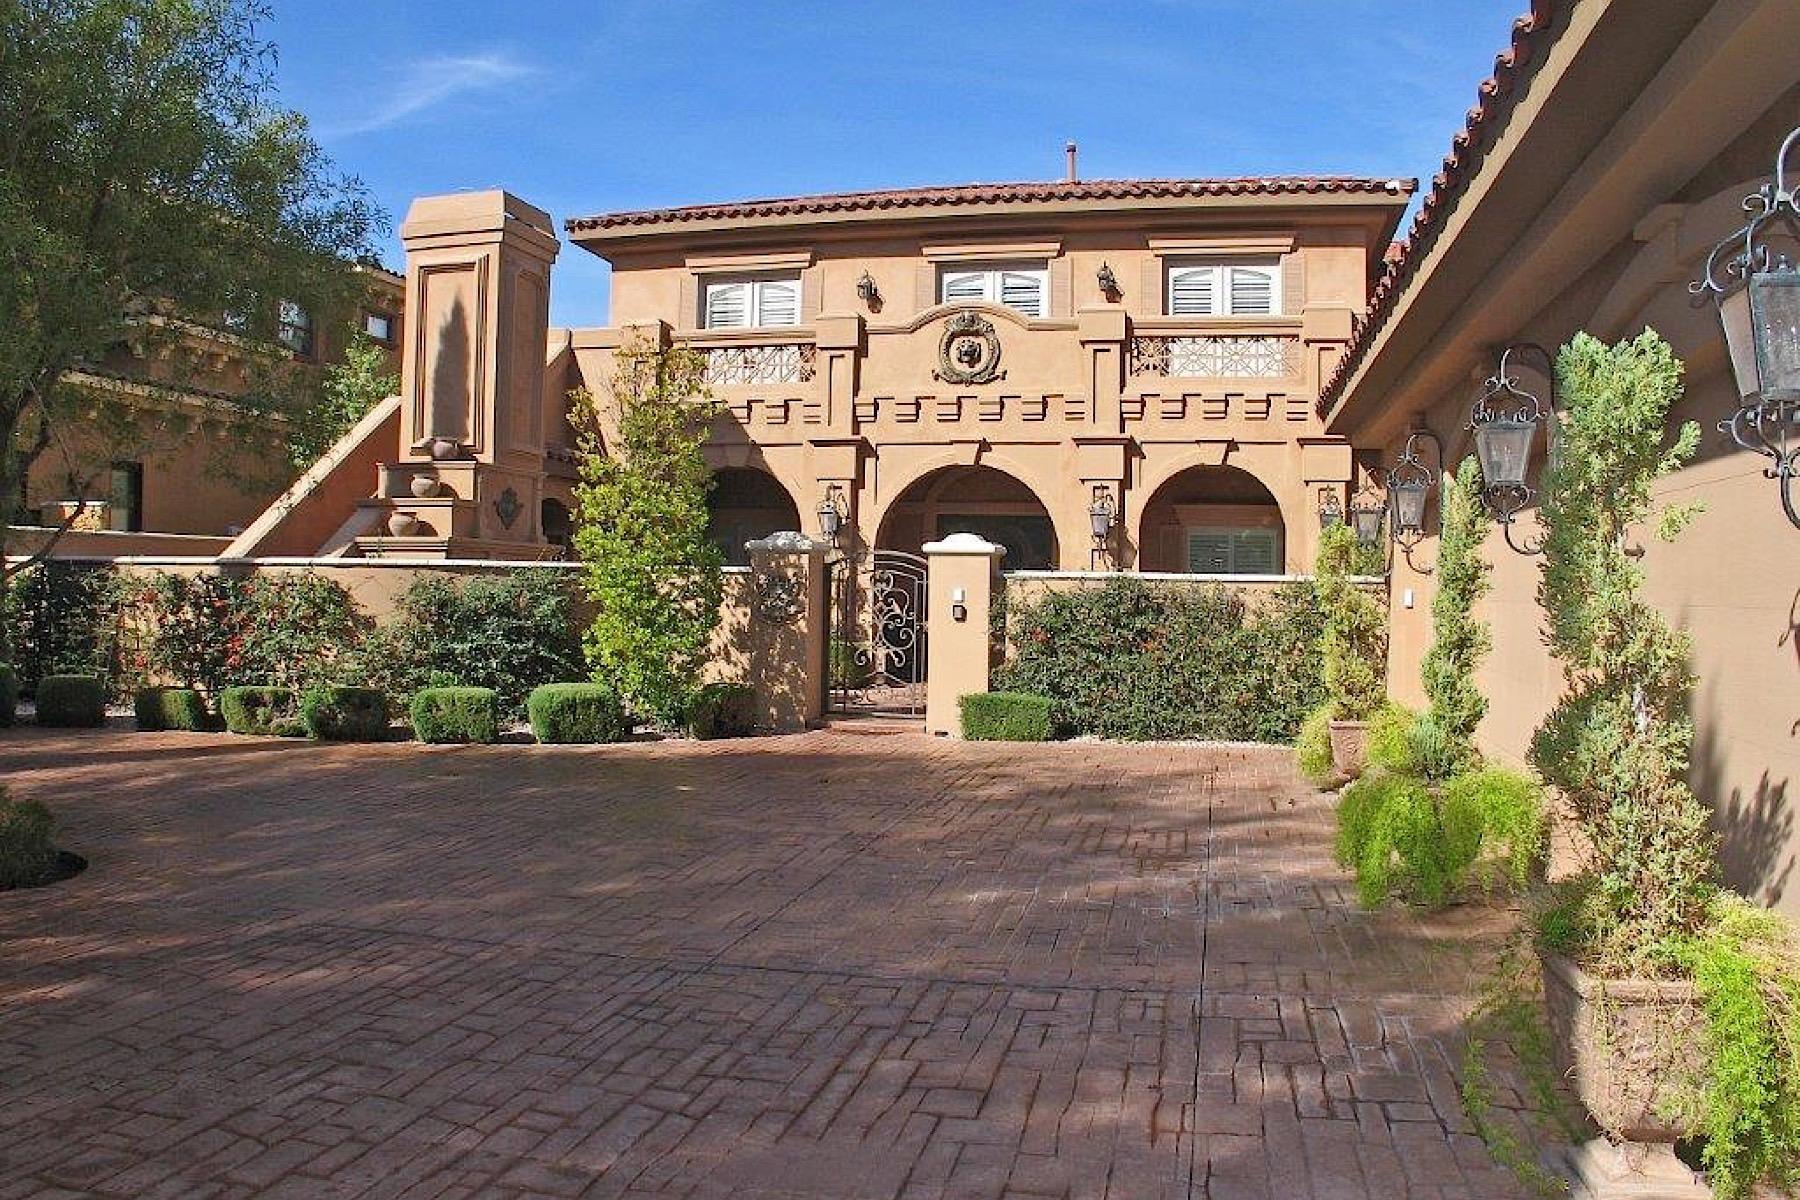 Single Family Home for Sale at 2 Via Modena Ct Henderson, Nevada 89011 United StatesIn/Around: Las Vegas